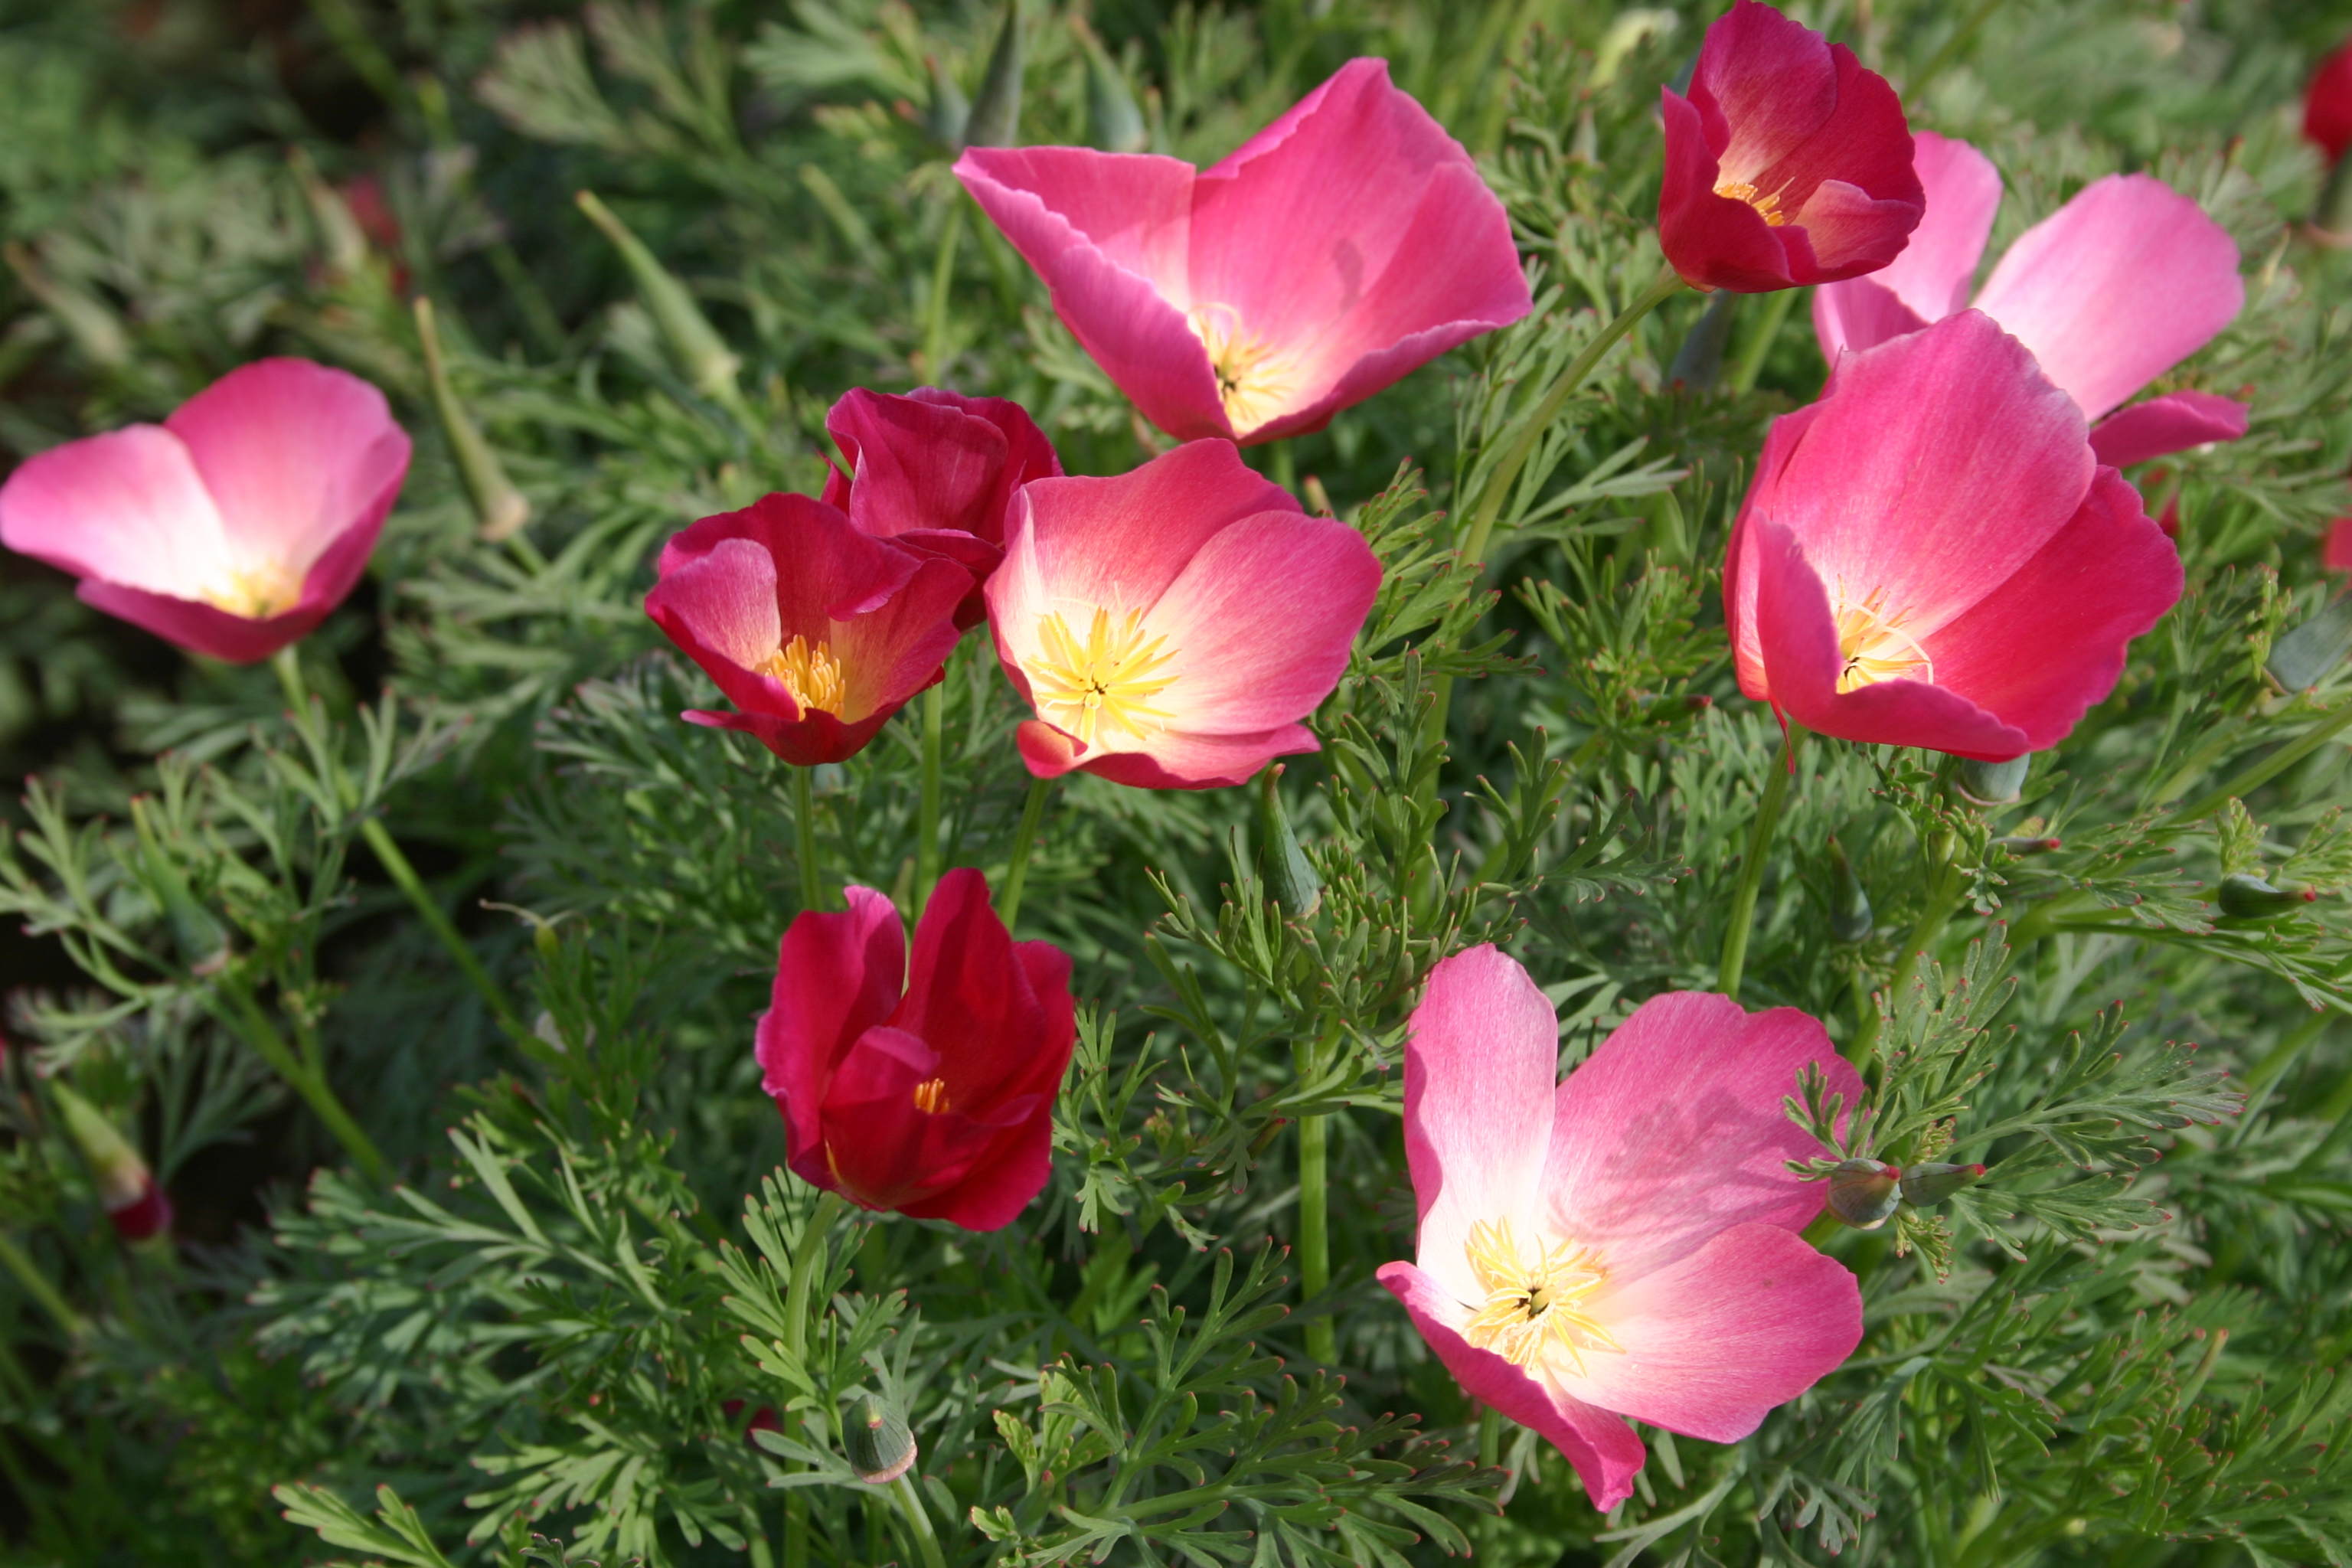 Poppy California Carmine Oregon Wholesale Seed Company